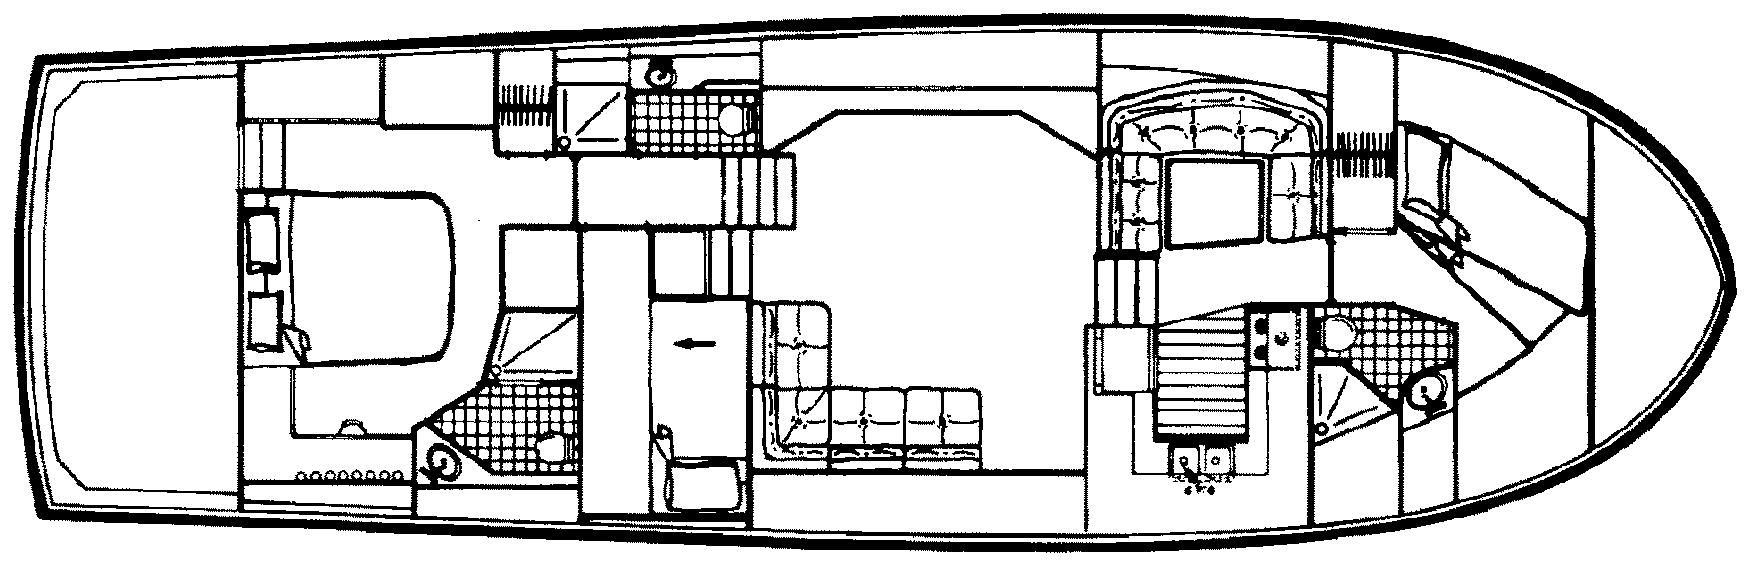 55 Cockpit Motor Yacht Floor Plan 2